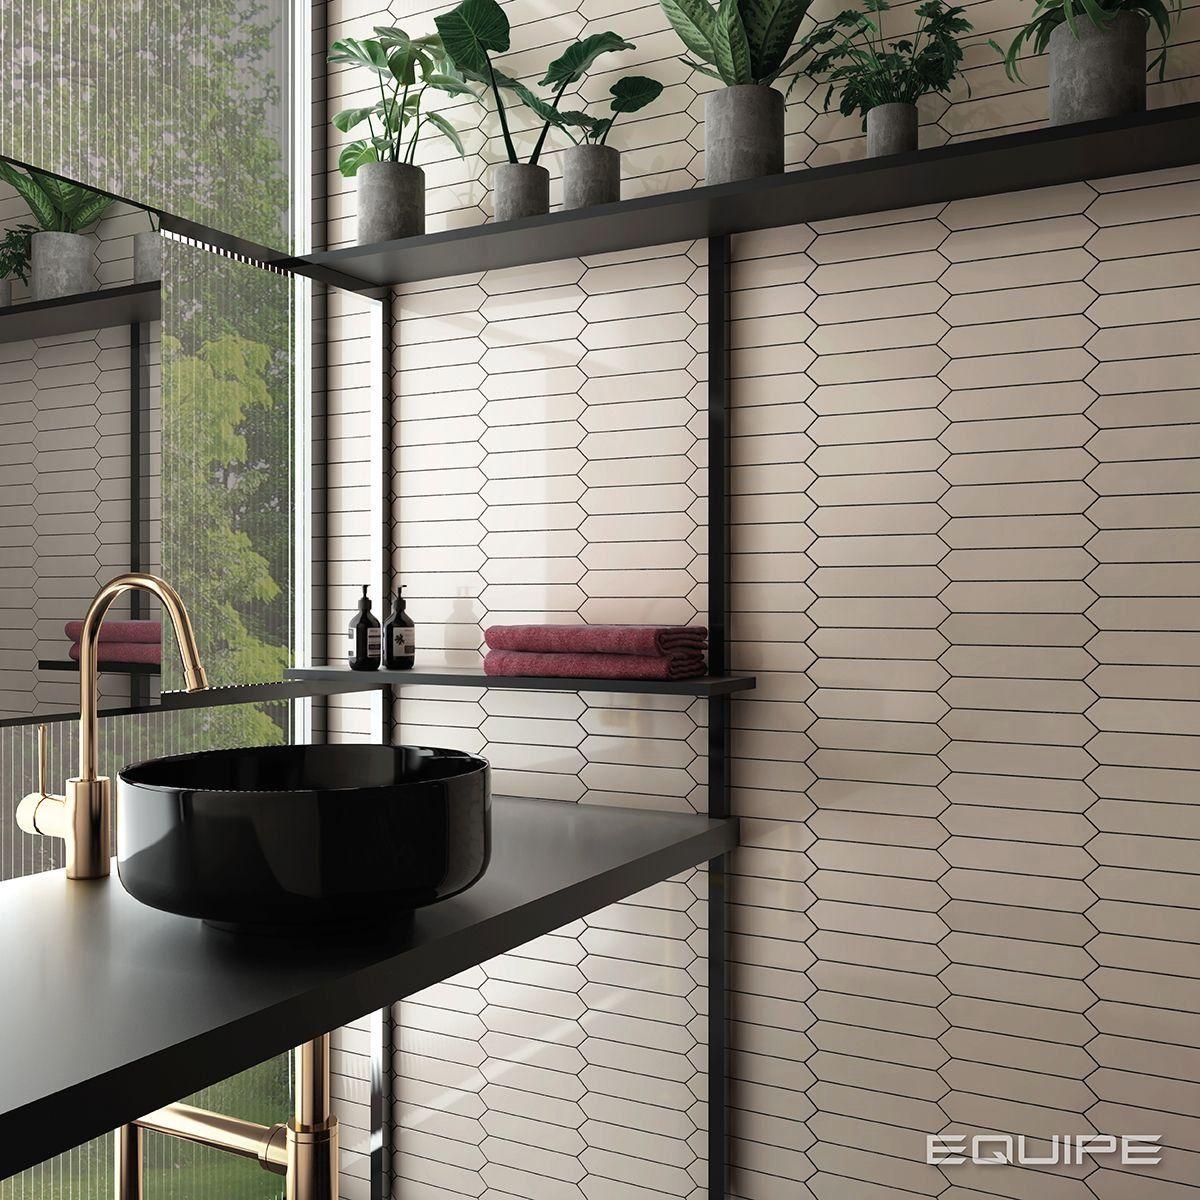 Arrow Creamy Contemporary Wall Tiles 1000 In 2020 Wall Tiles Ceramic Wall Tiles Contemporary Wall